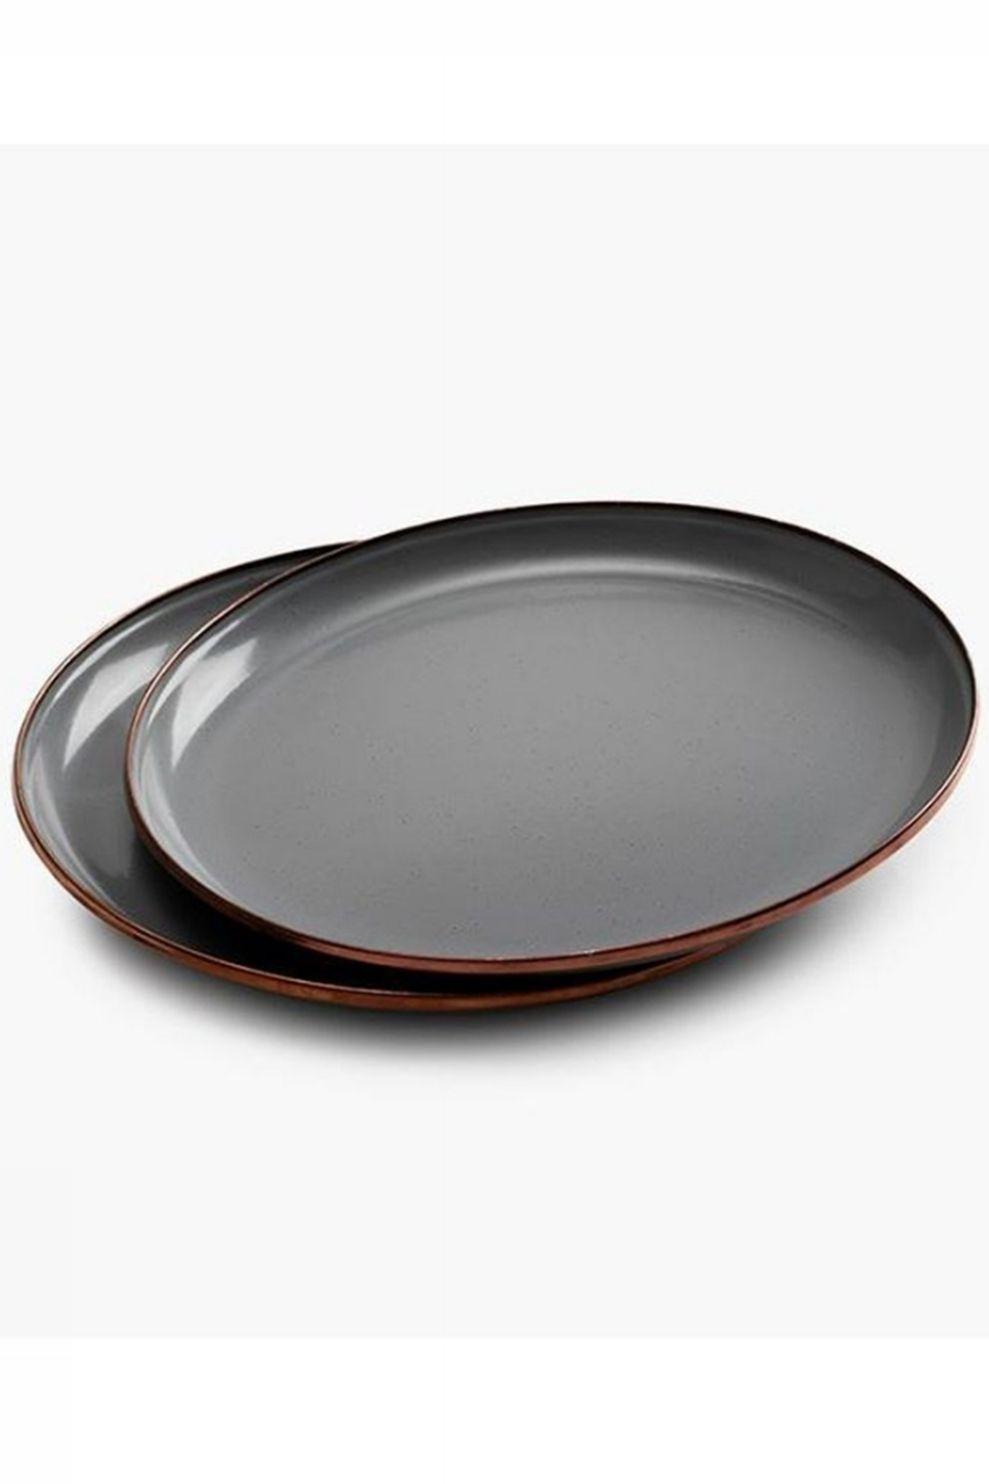 Barebones Living Plate Emaille 2Pcs - Grijs